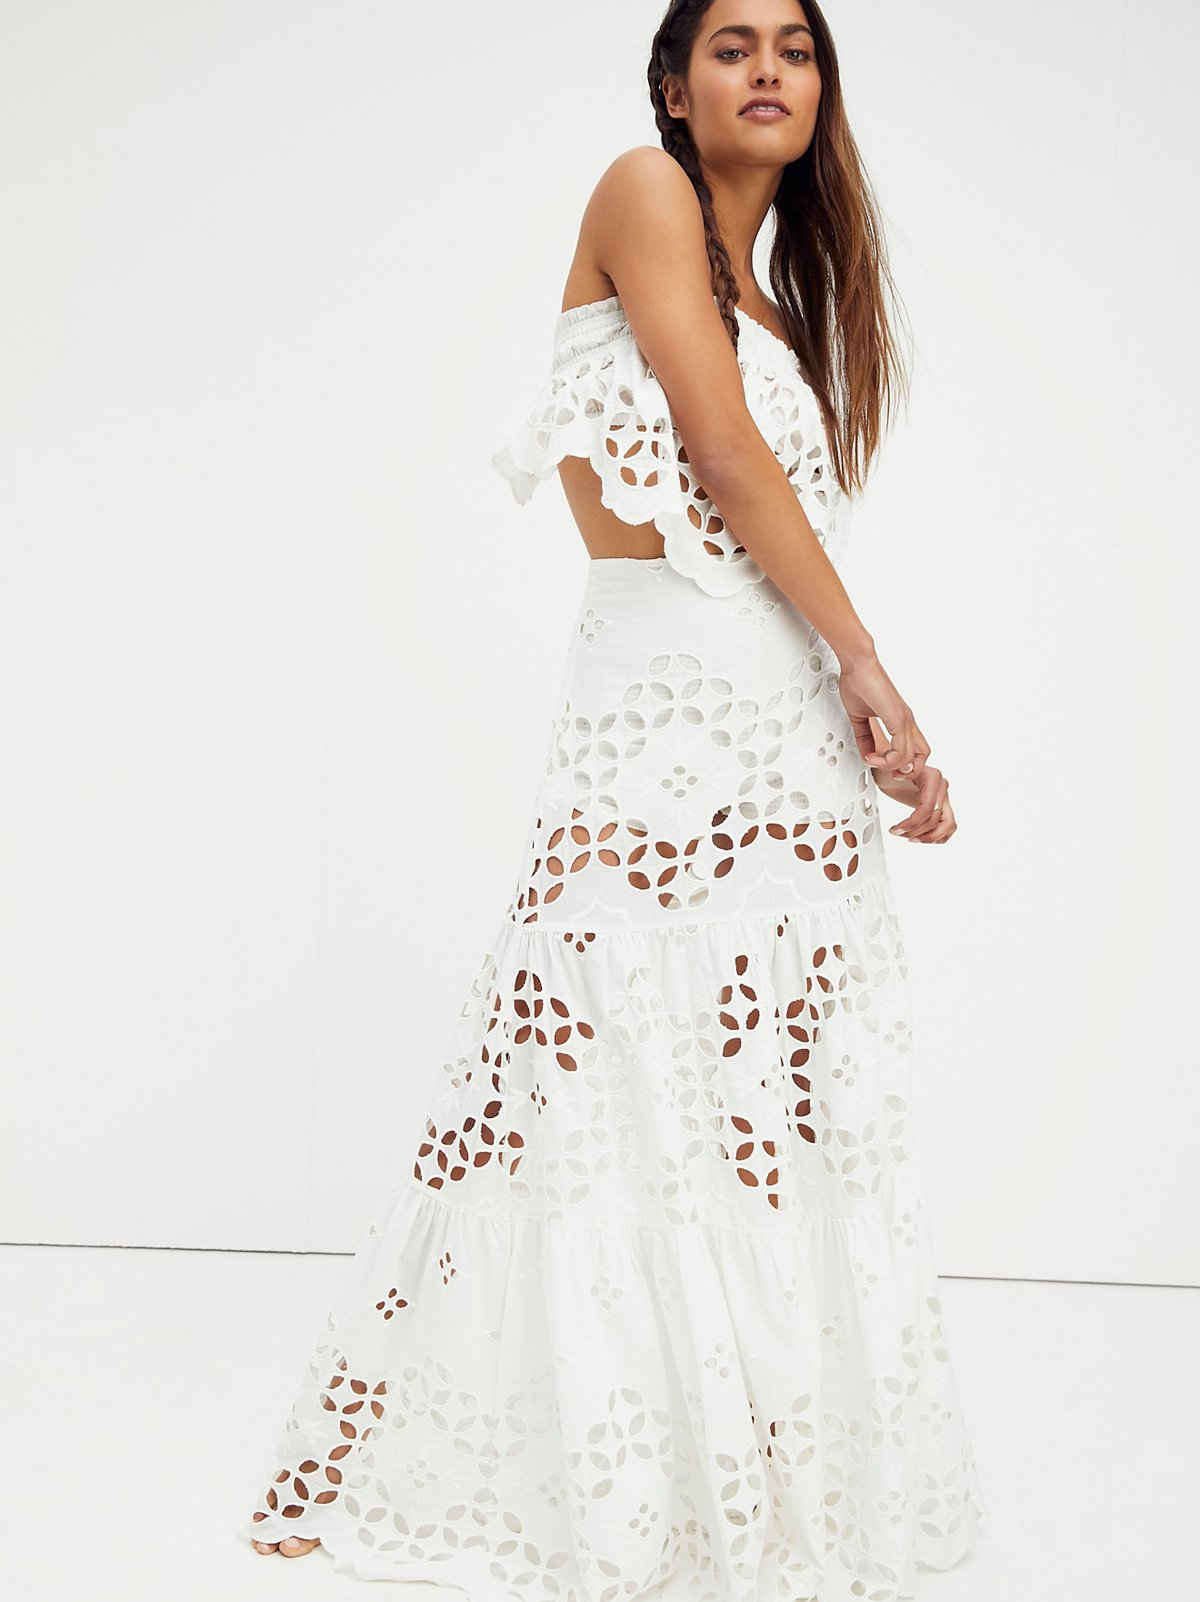 Party Dresses, Lace Dresses & Sequin Dresses | Free People